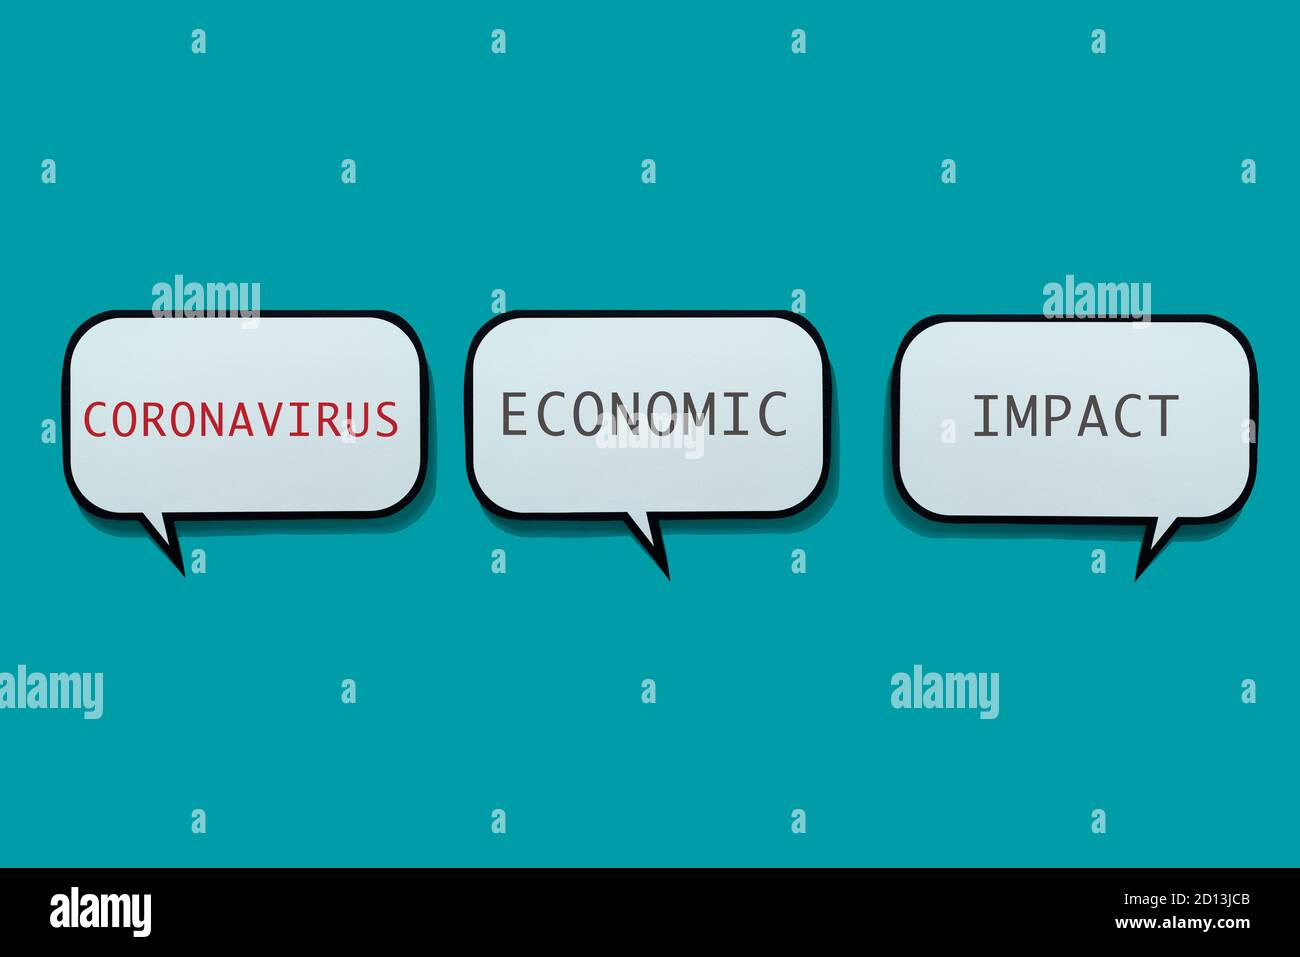 the text coronavirus economic impact in some speech balloons on a blue background Stock Photo